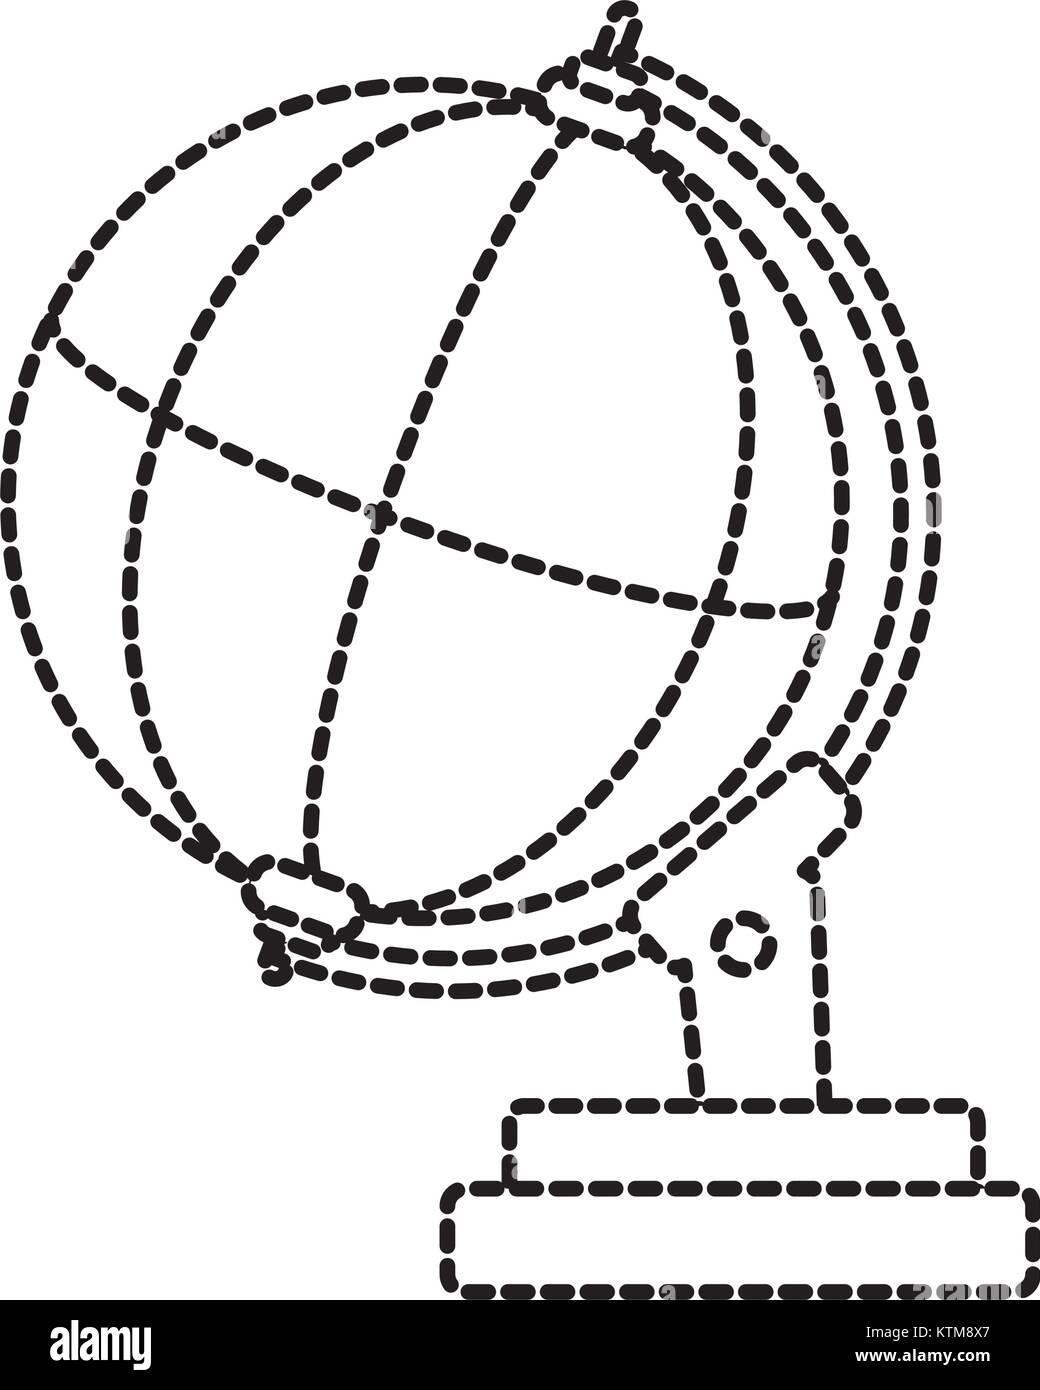 Global sphere design - Stock Vector